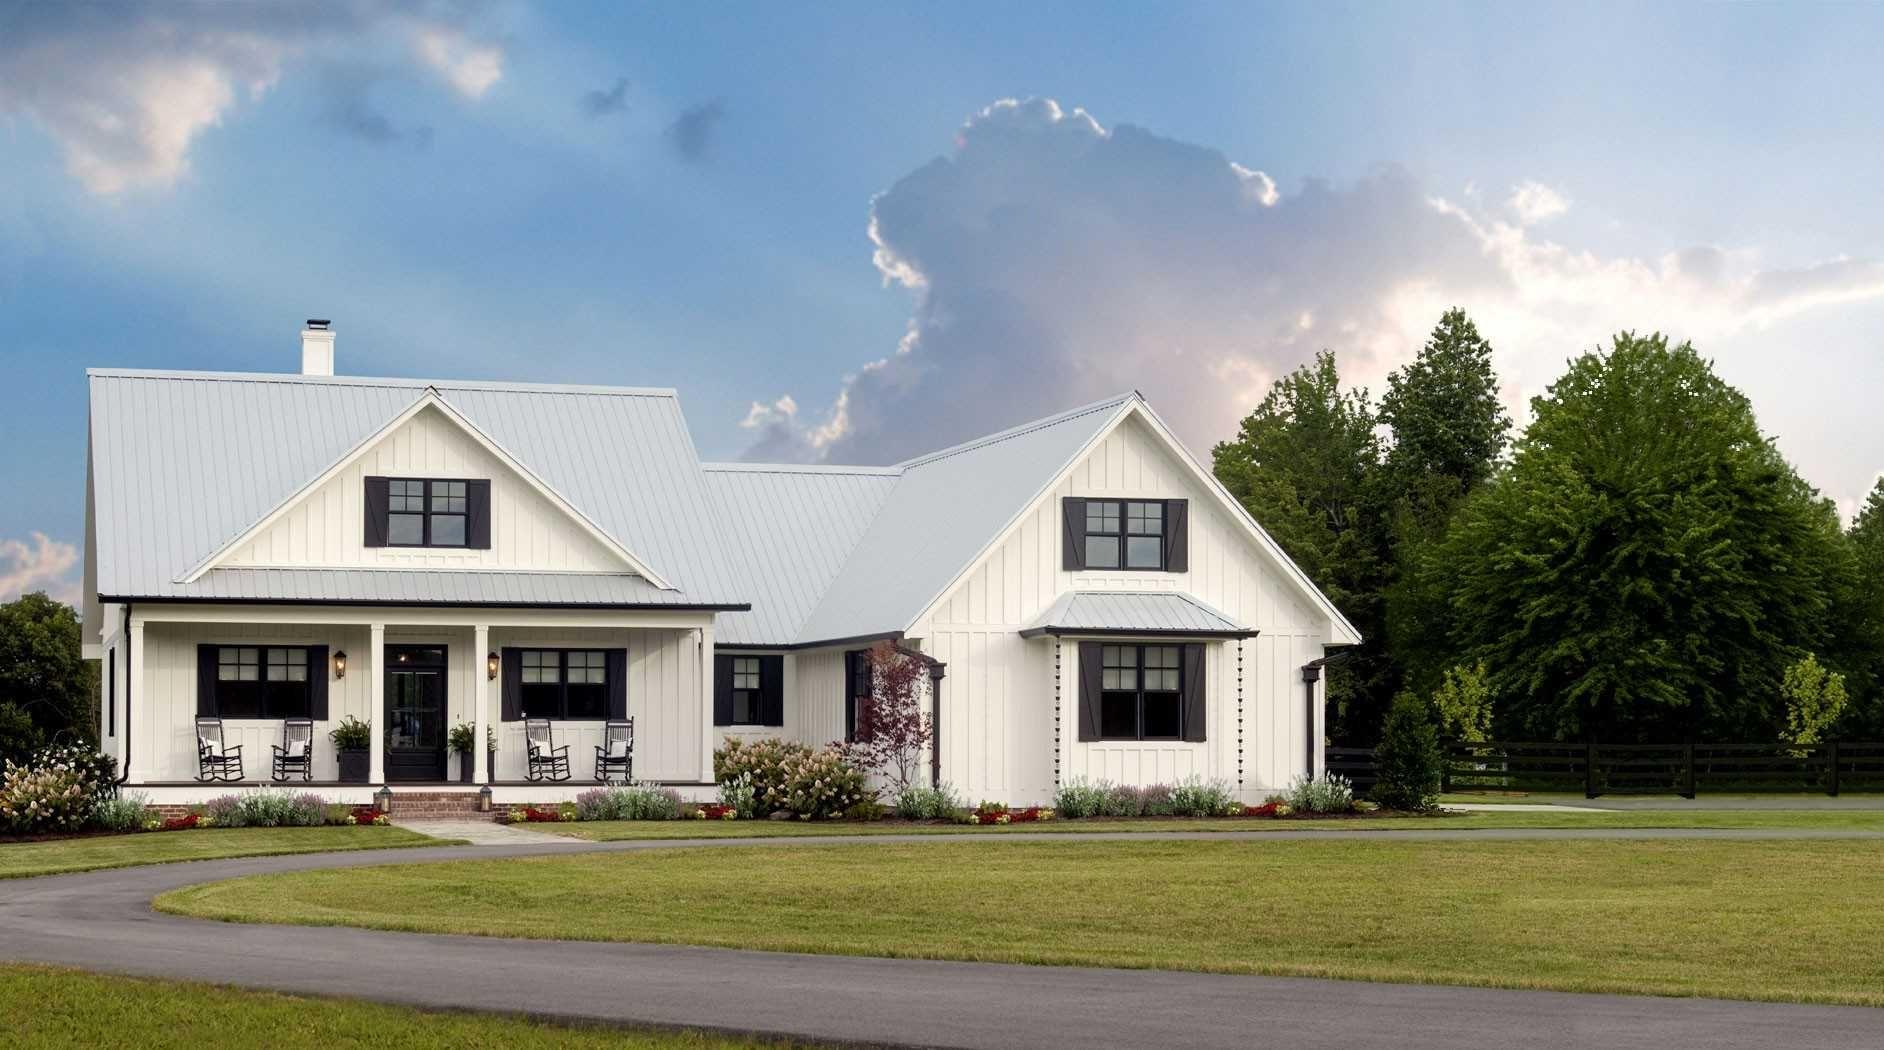 Single Story Modern Farmhouse Open Floor Plans Inspirational 11 Unique Single Story Far Modern Farmhouse Plans House Plans Farmhouse Modern Farmhouse Floorplan